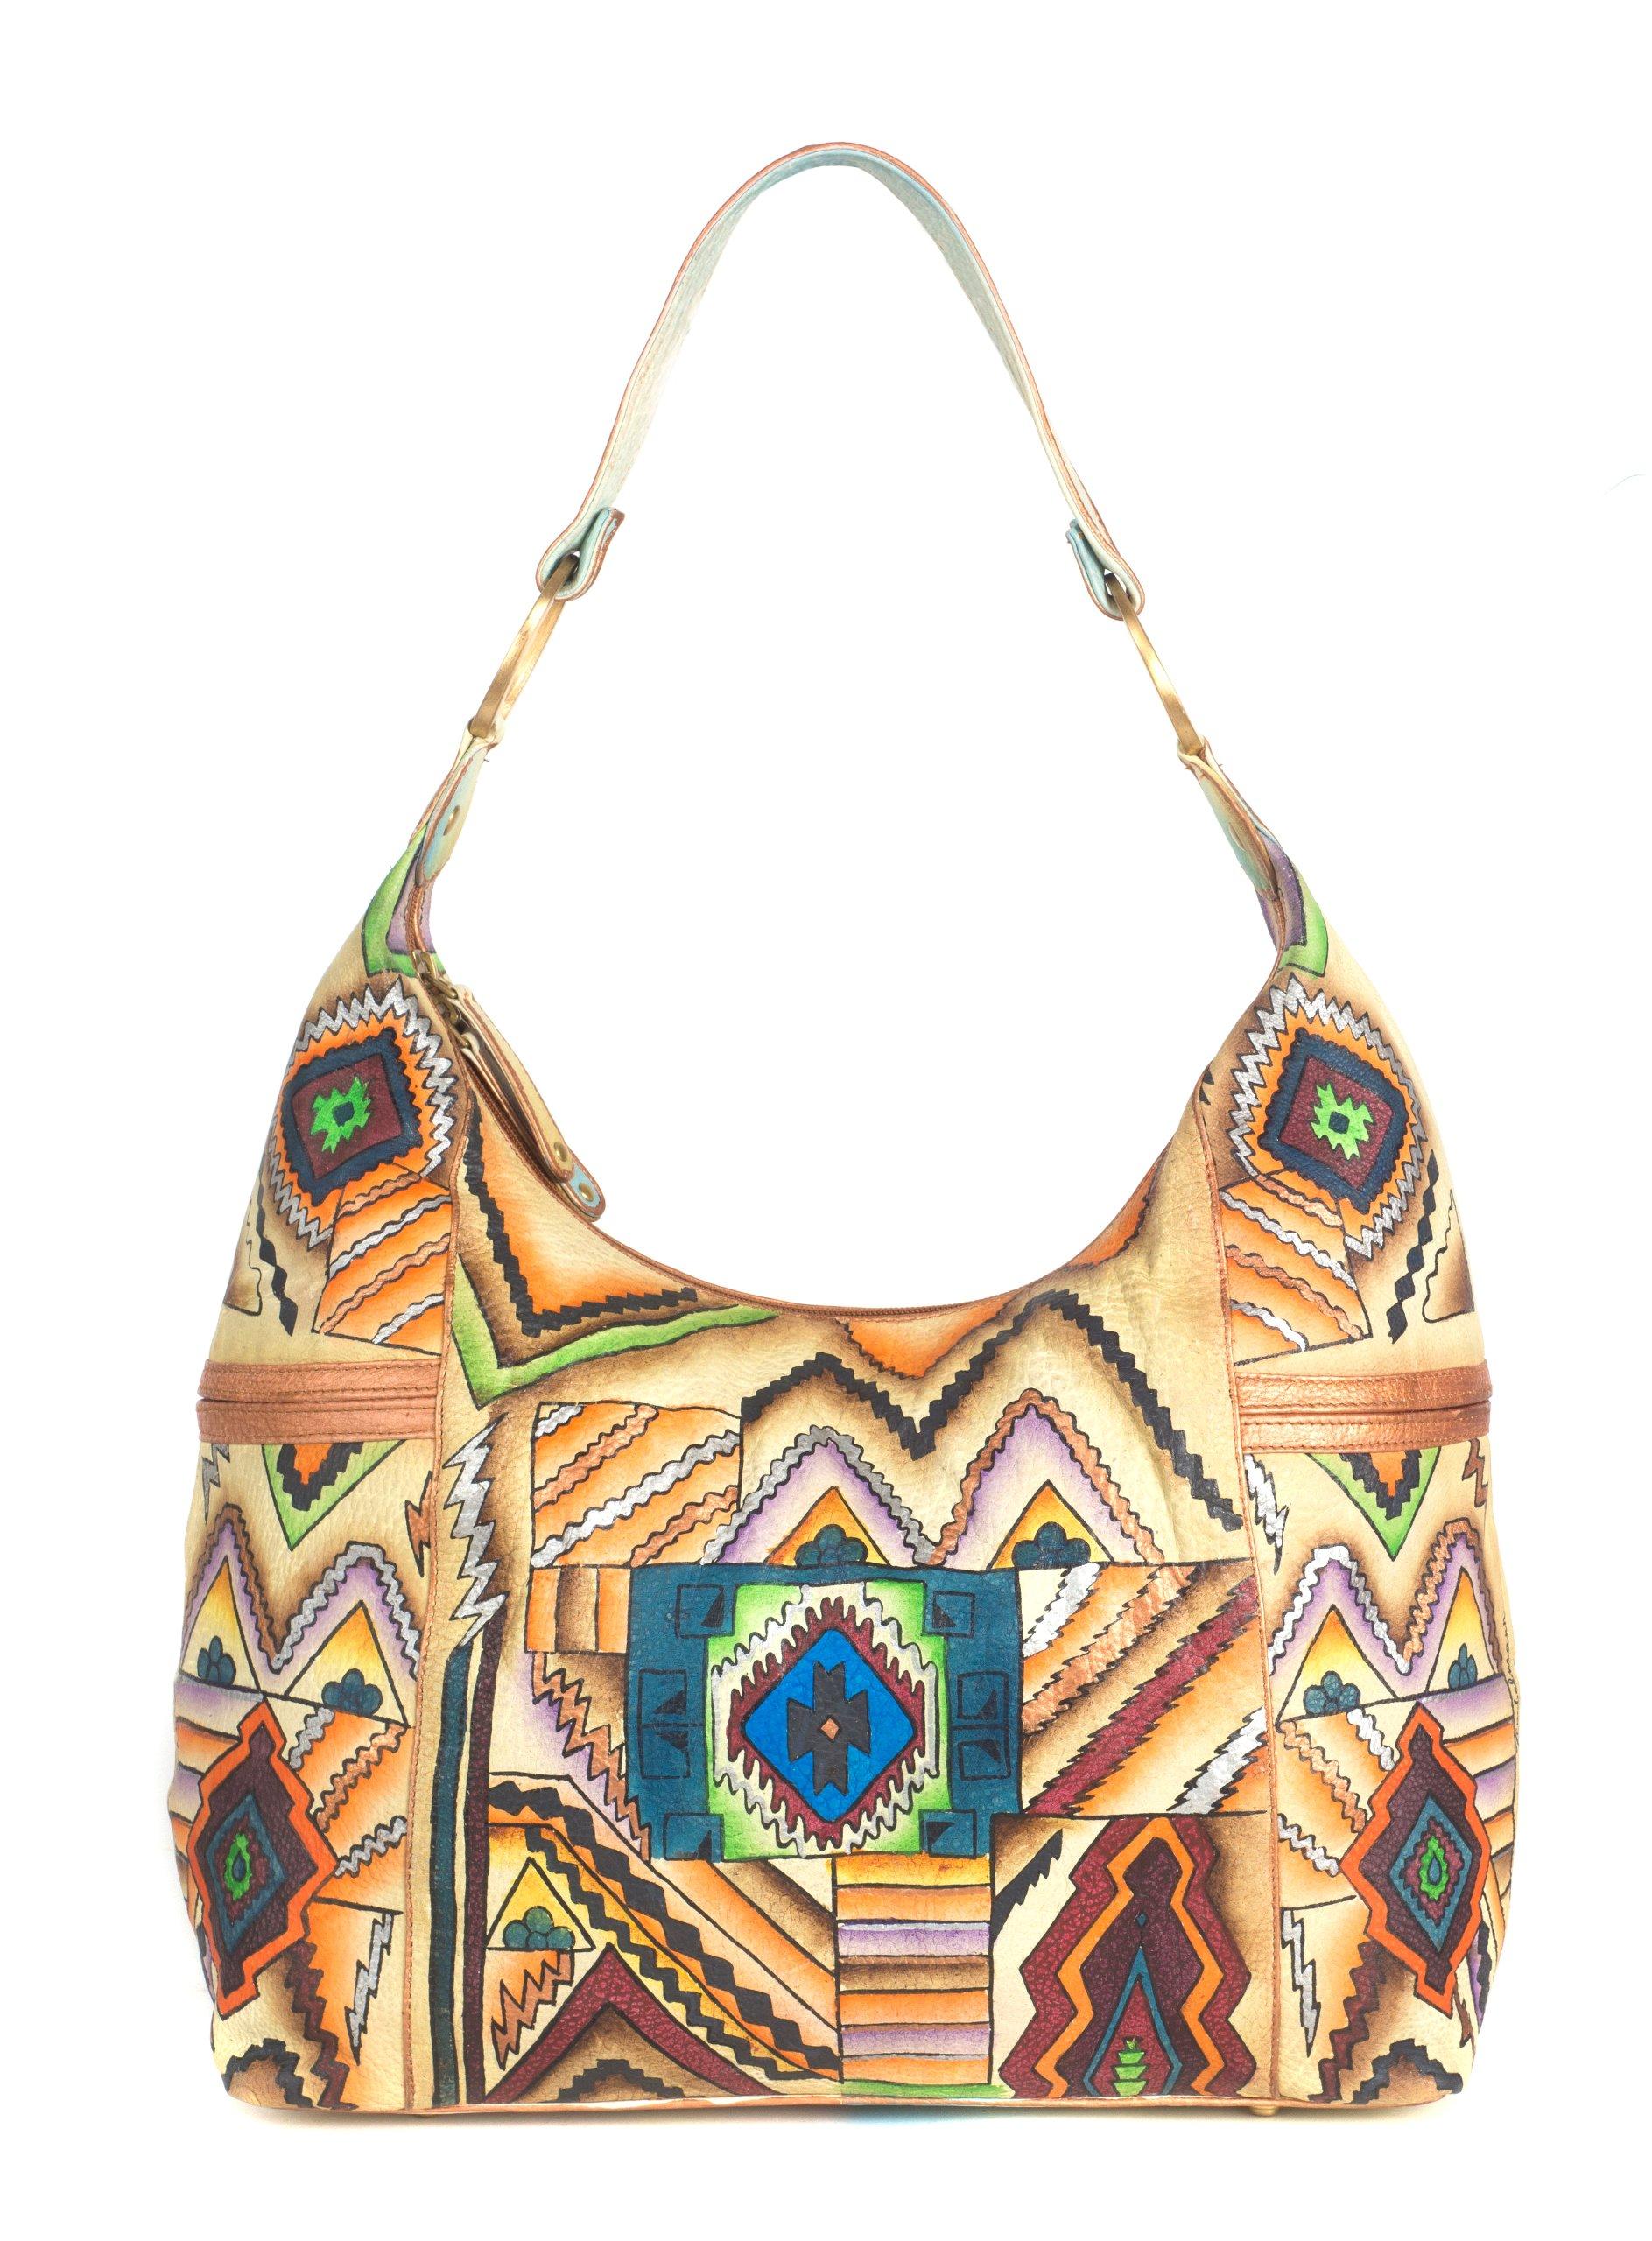 ZIMBELMANN RUTH Genuine Nappa Leather Hand-painted Hobo Shoulder Bag by Zimbelmann